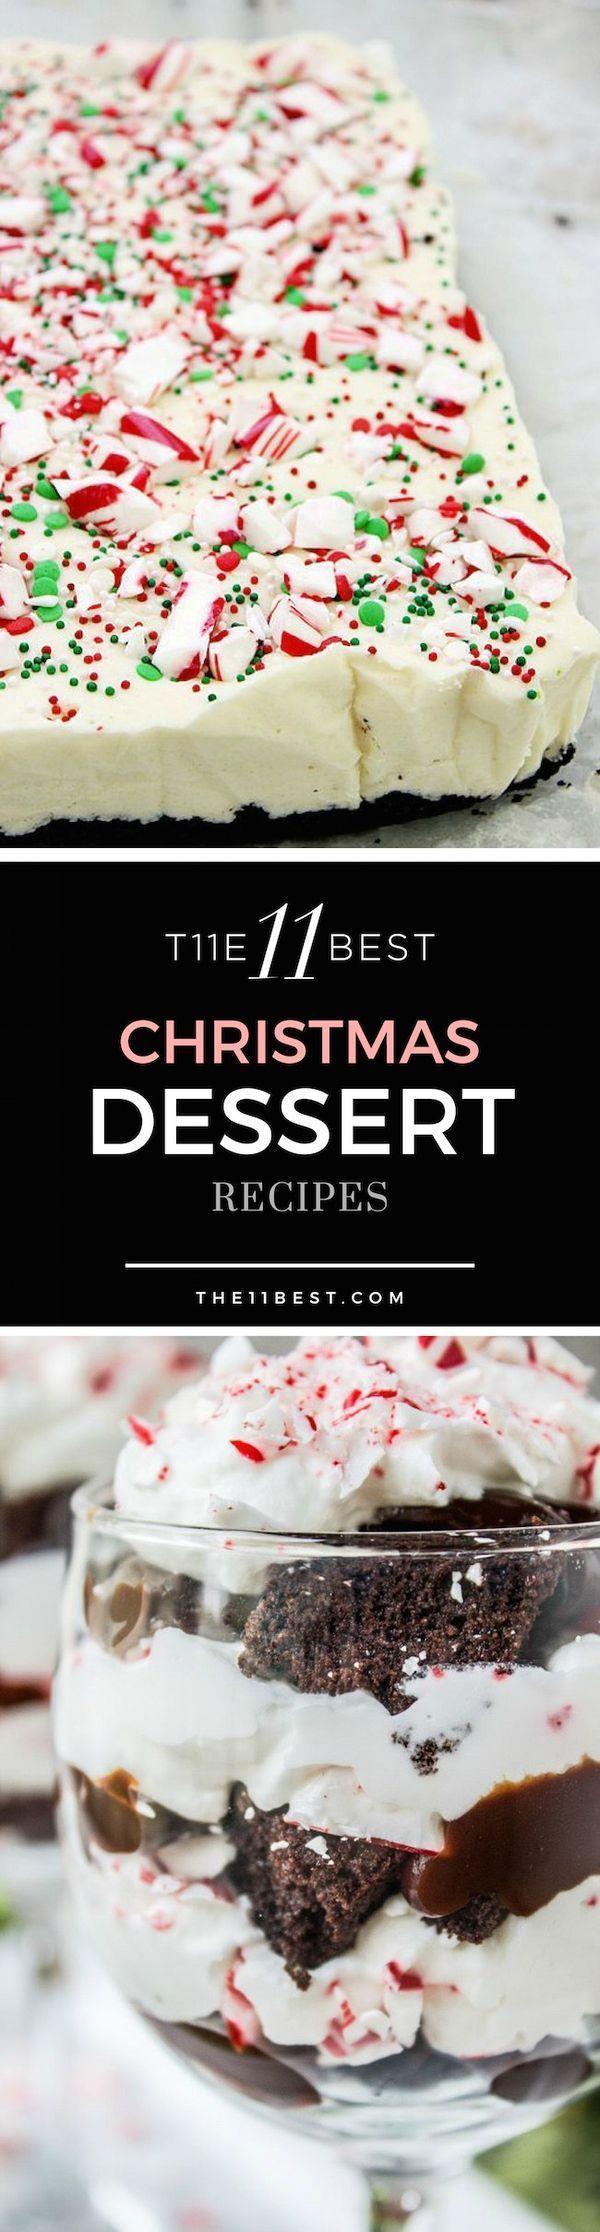 The Best Homemade Christmas Dessert Recipes (Winter Dessert Recipes)